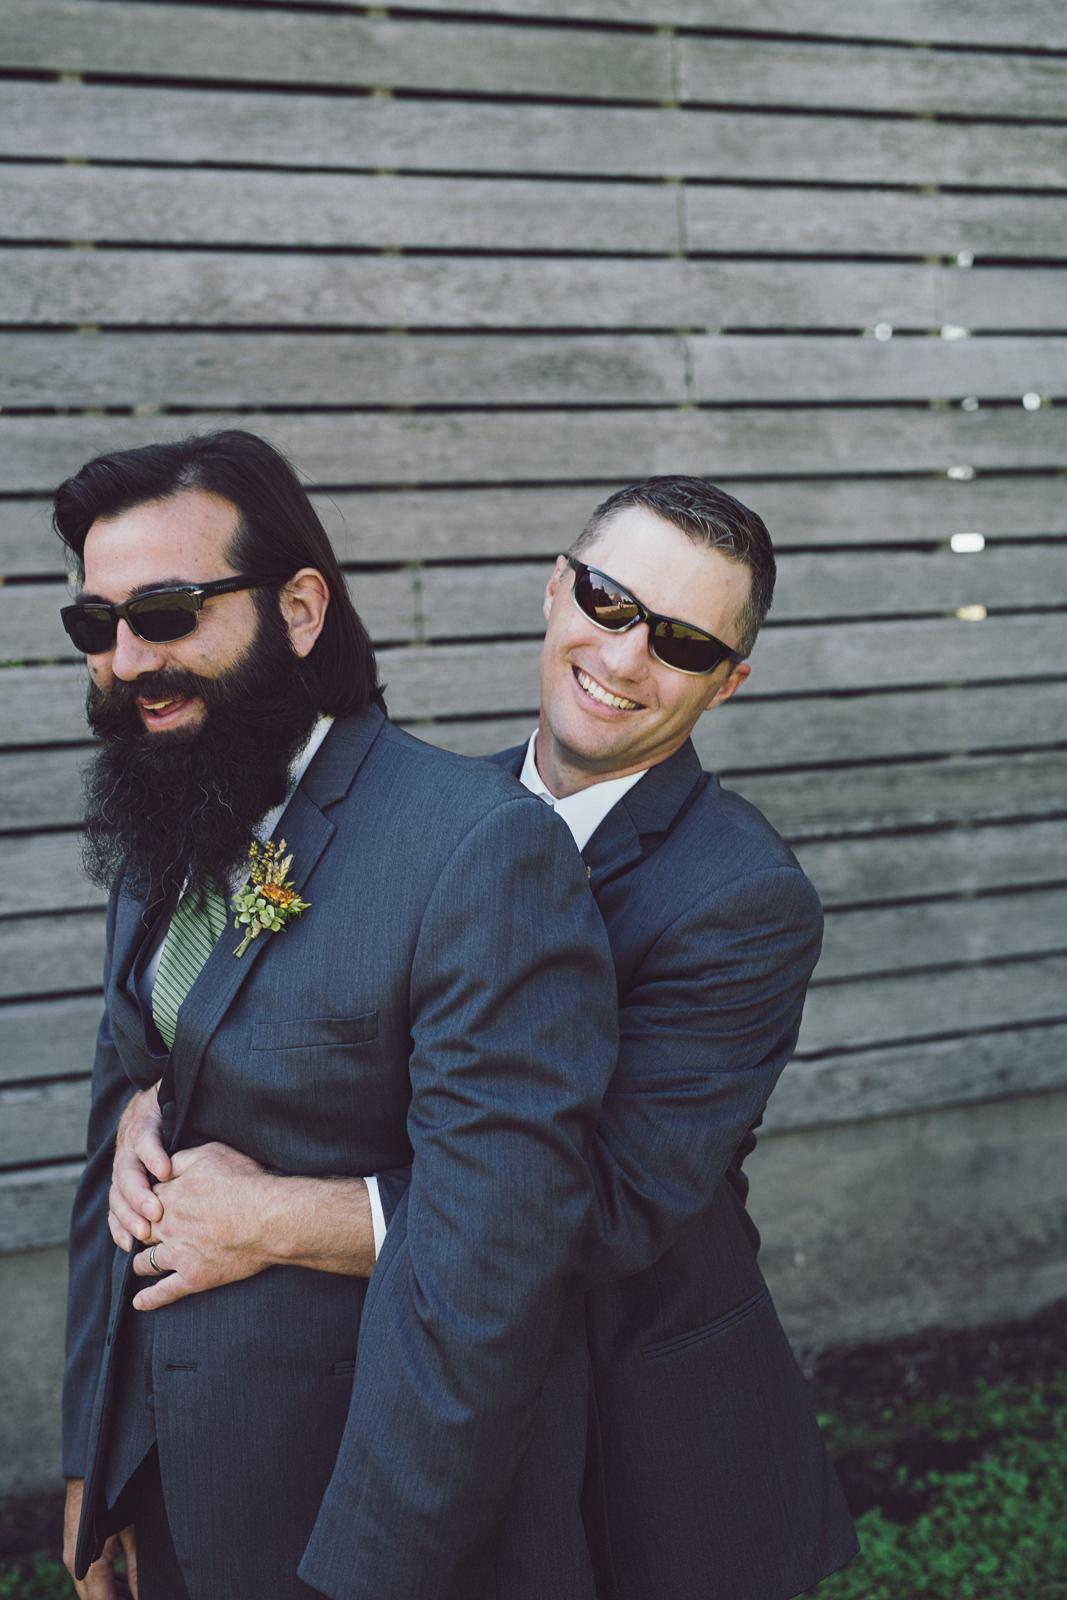 wedding-keely-caleb-733-name-your-photo.jpg